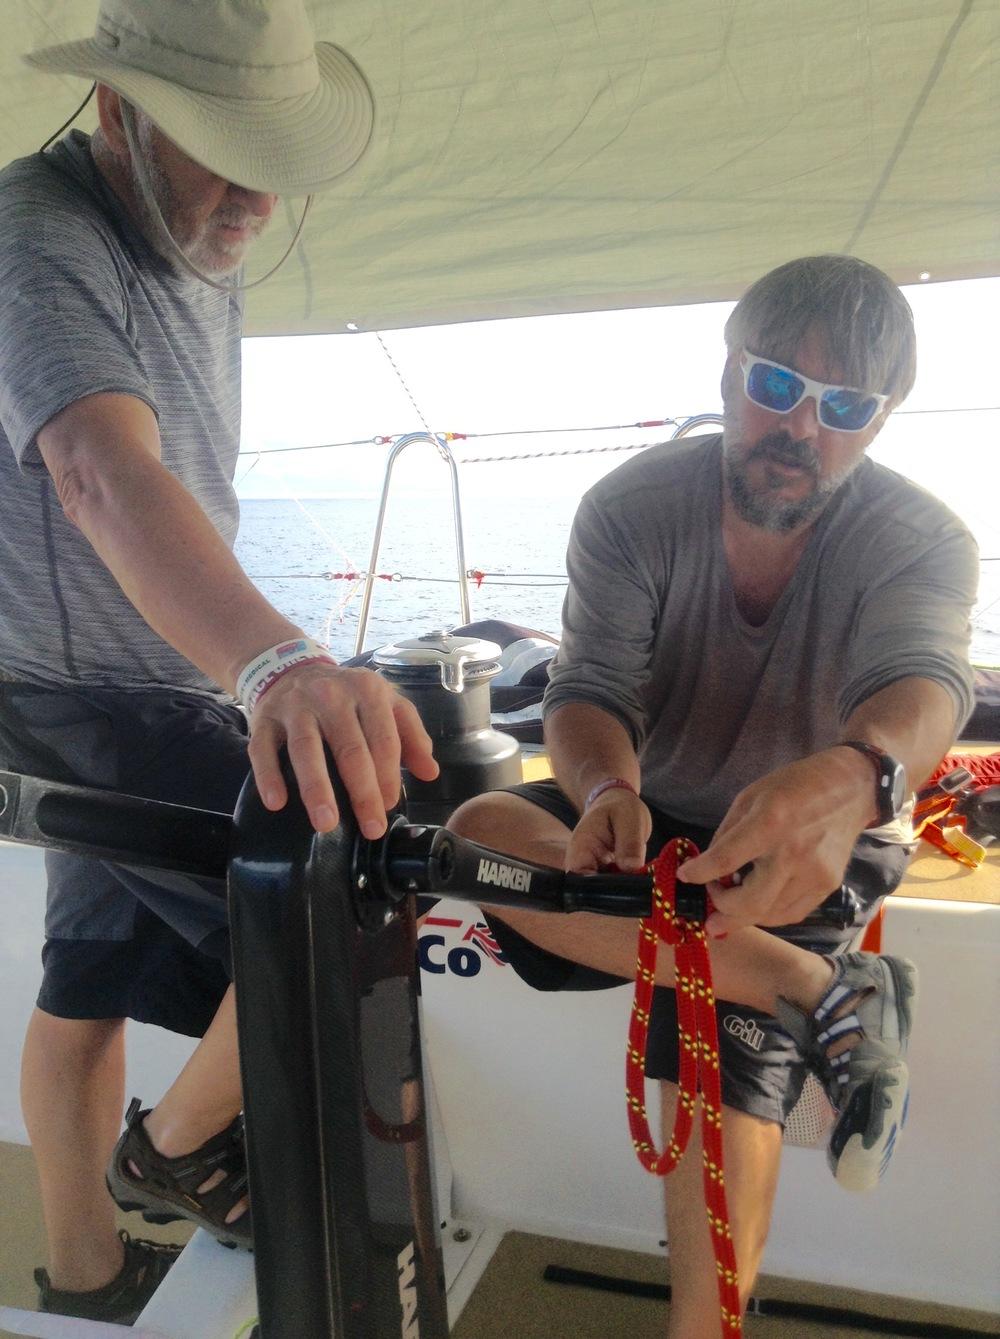 Craig demos constrictor knot